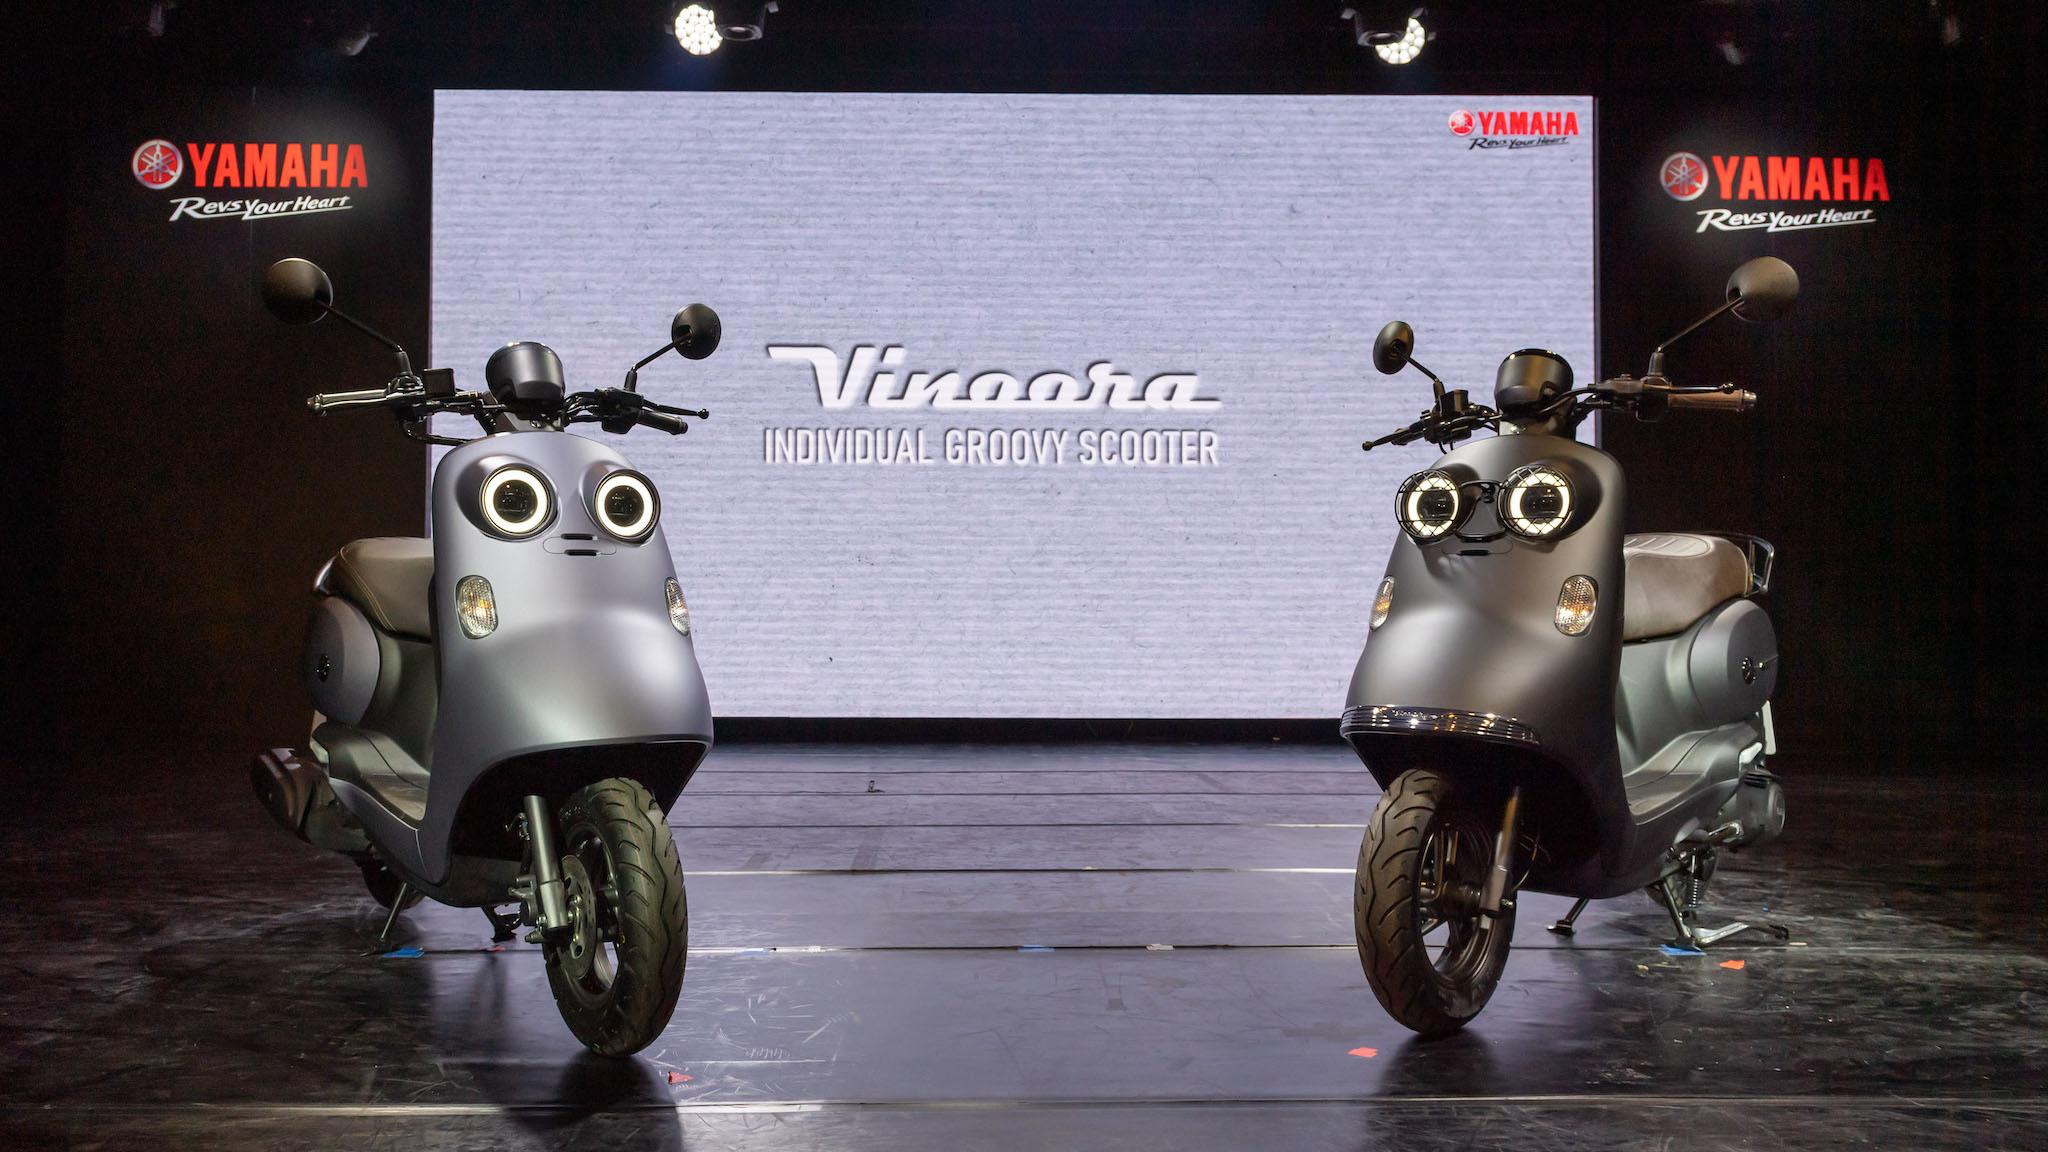 Yamaha Vinoora 即日起至 12 月 31 日止購車即享 18 期零利率分期。